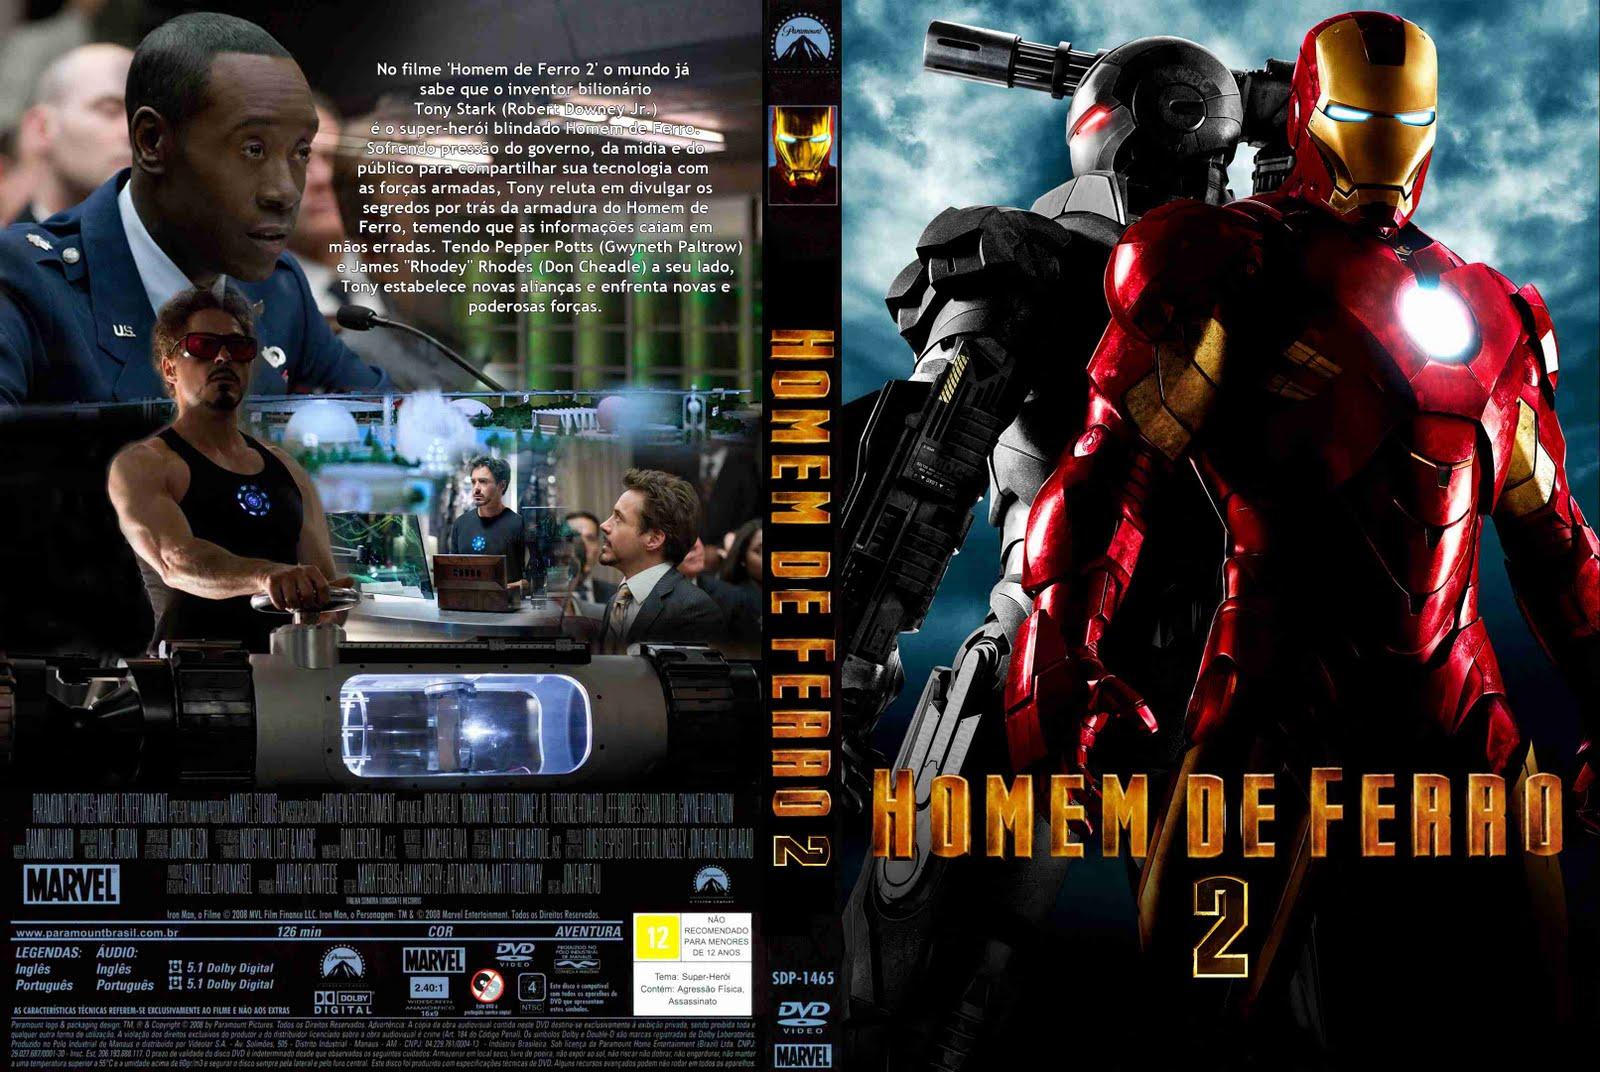 http://2.bp.blogspot.com/_x8uRn9_F6rY/S_XMGKVqWKI/AAAAAAAAAD4/2U3ZQlO4zc4/s1600/Homem-De-Ferro-2+capa+DVD.jpg